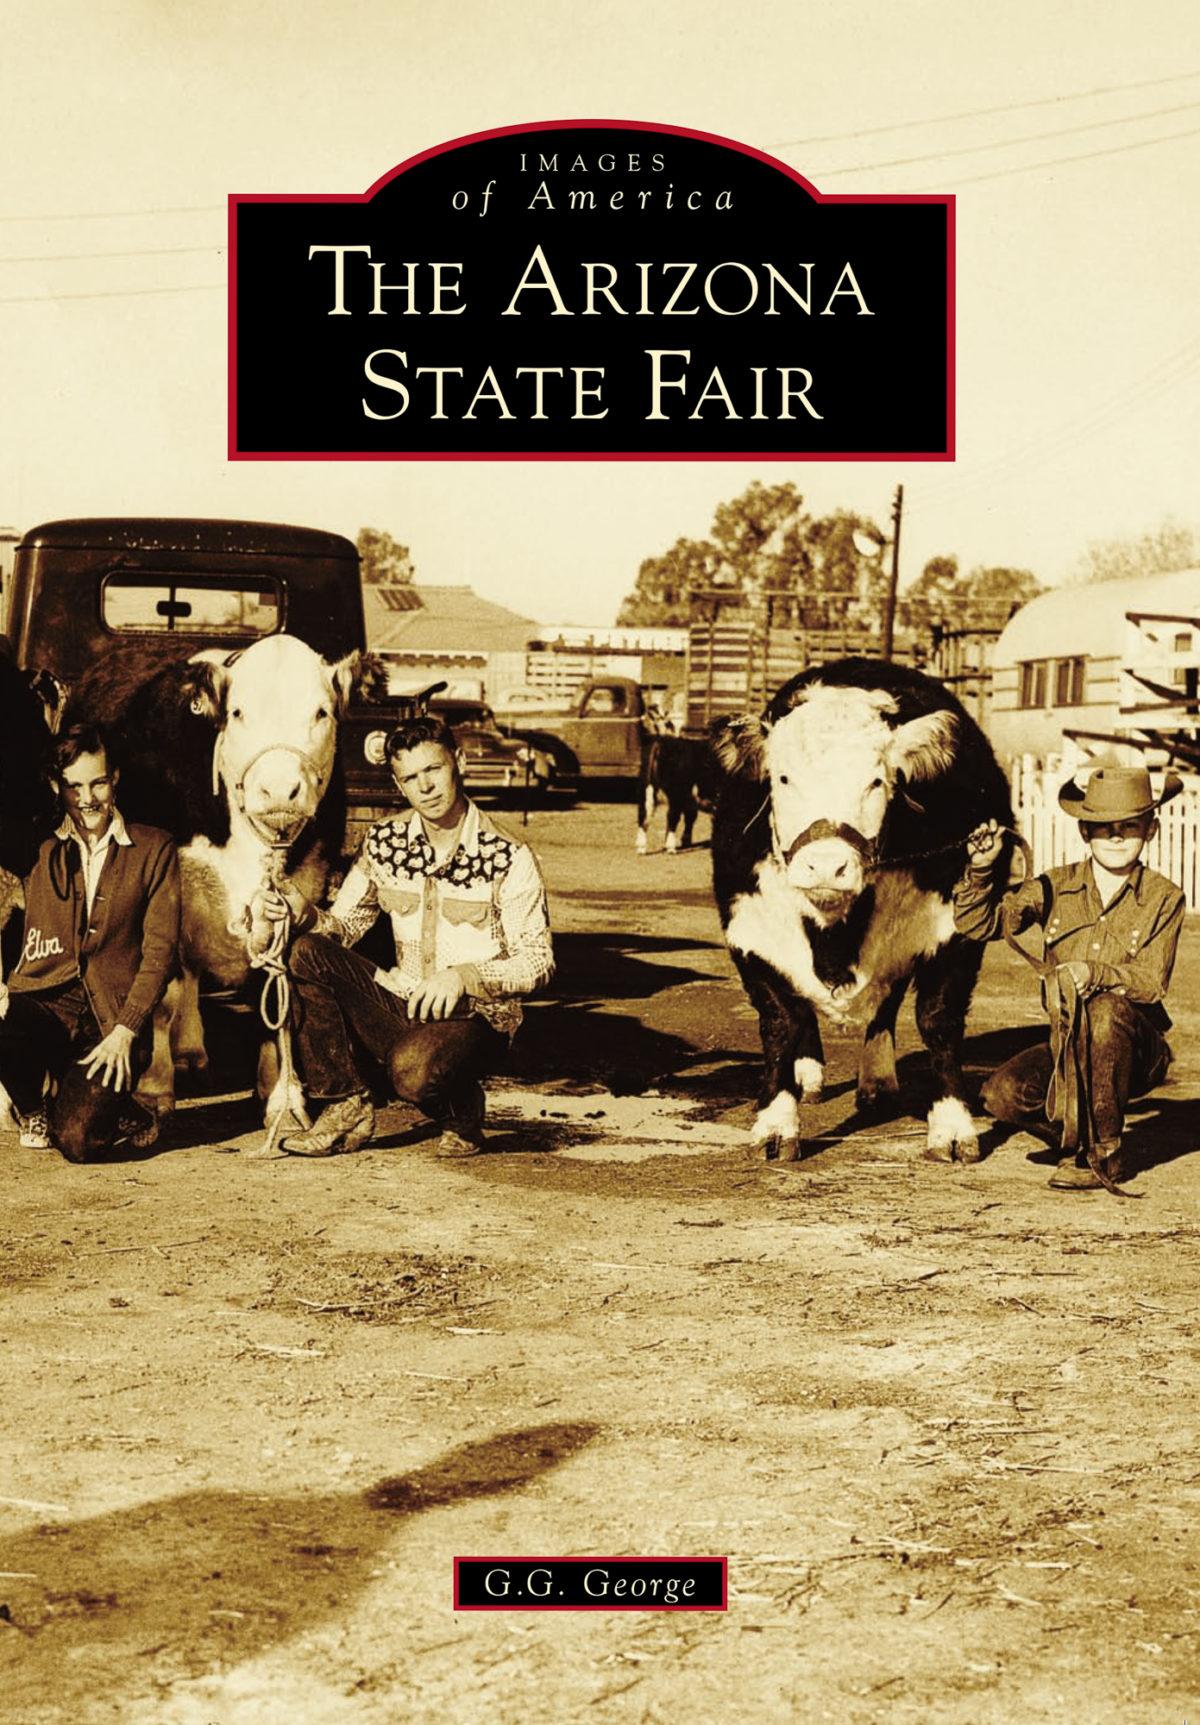 The Arizona State Fair book cover